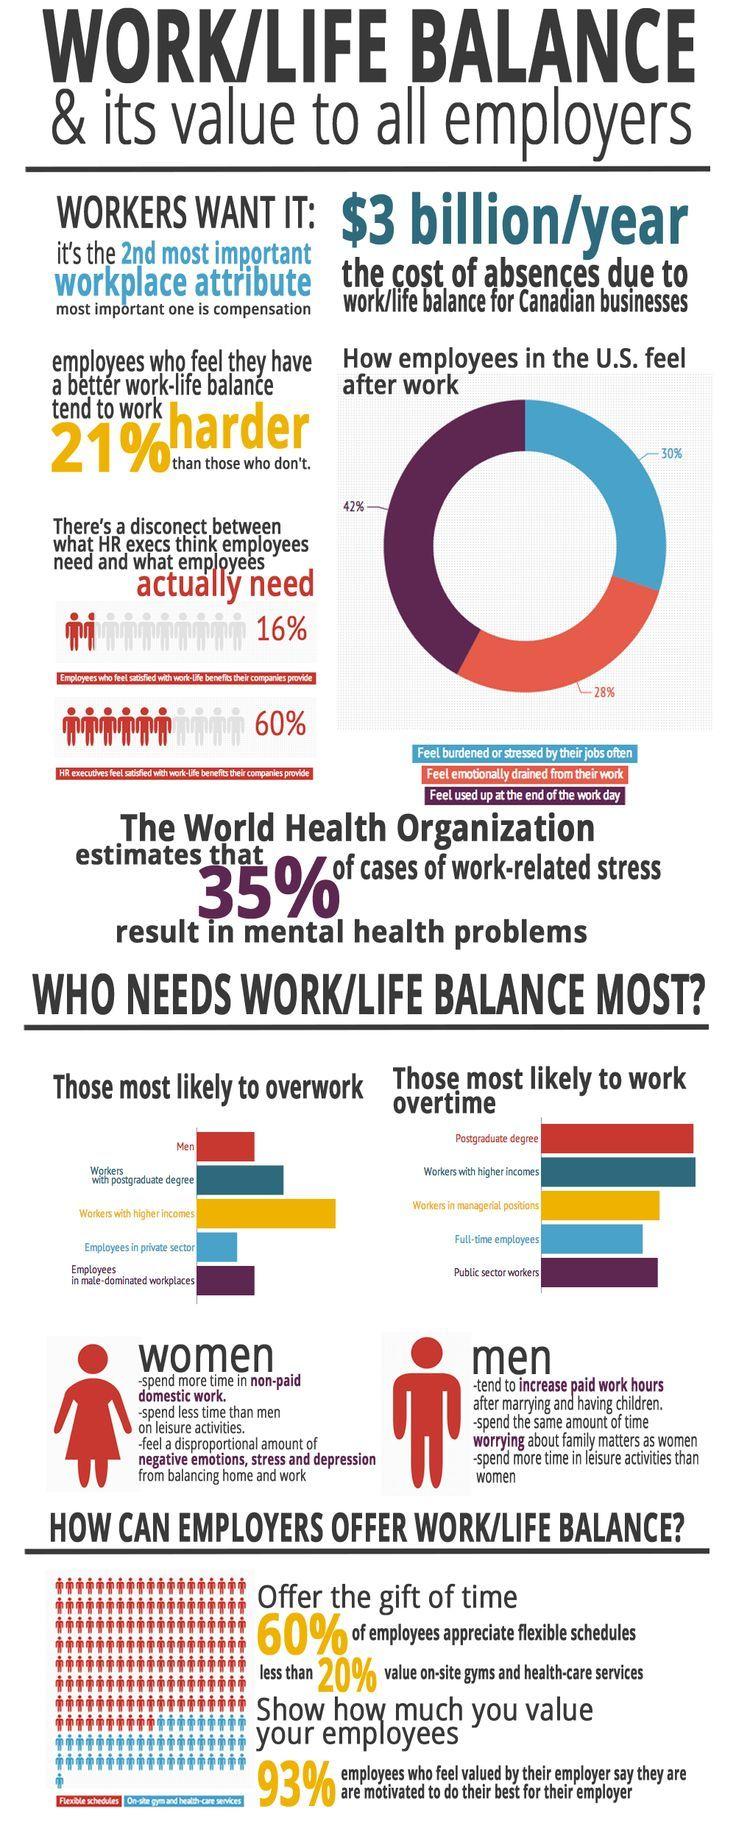 Worklife balance all employers should encourage it